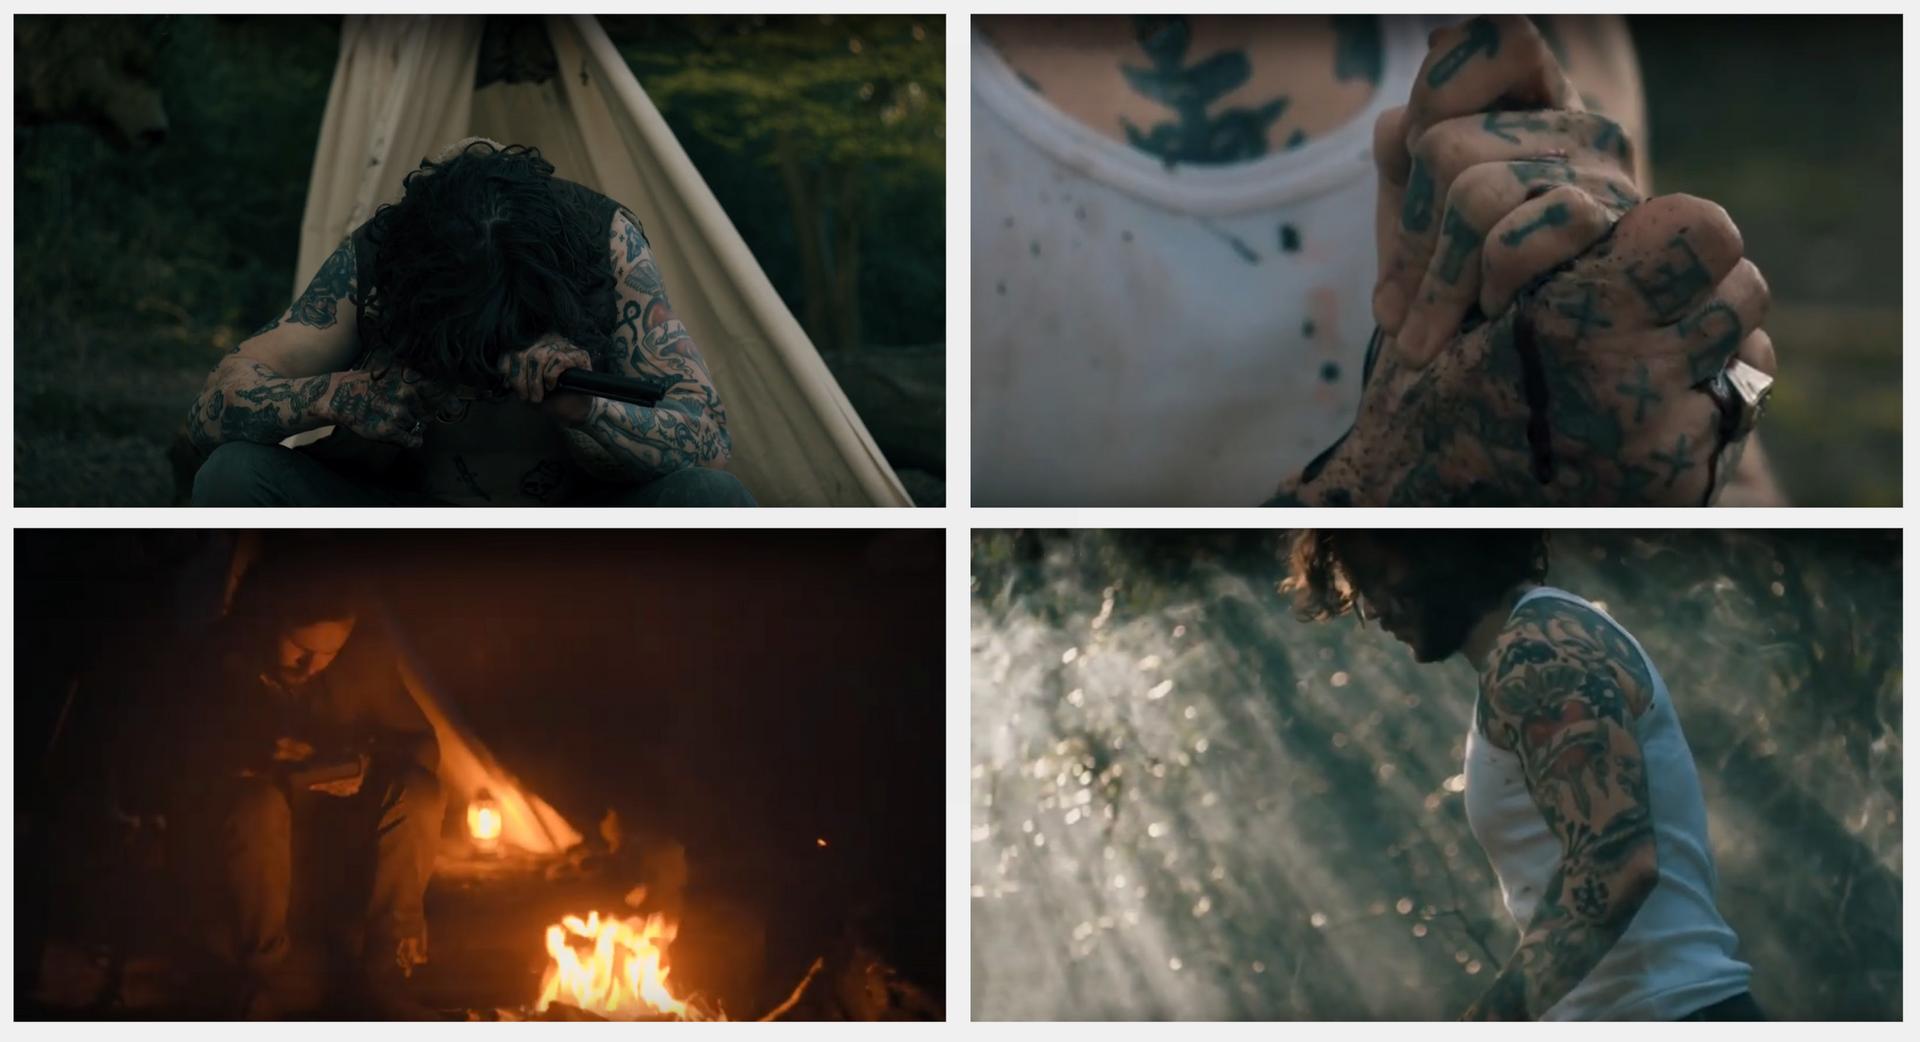 BLAKE, 'Ain't found no Gold' music video, Apr 2017